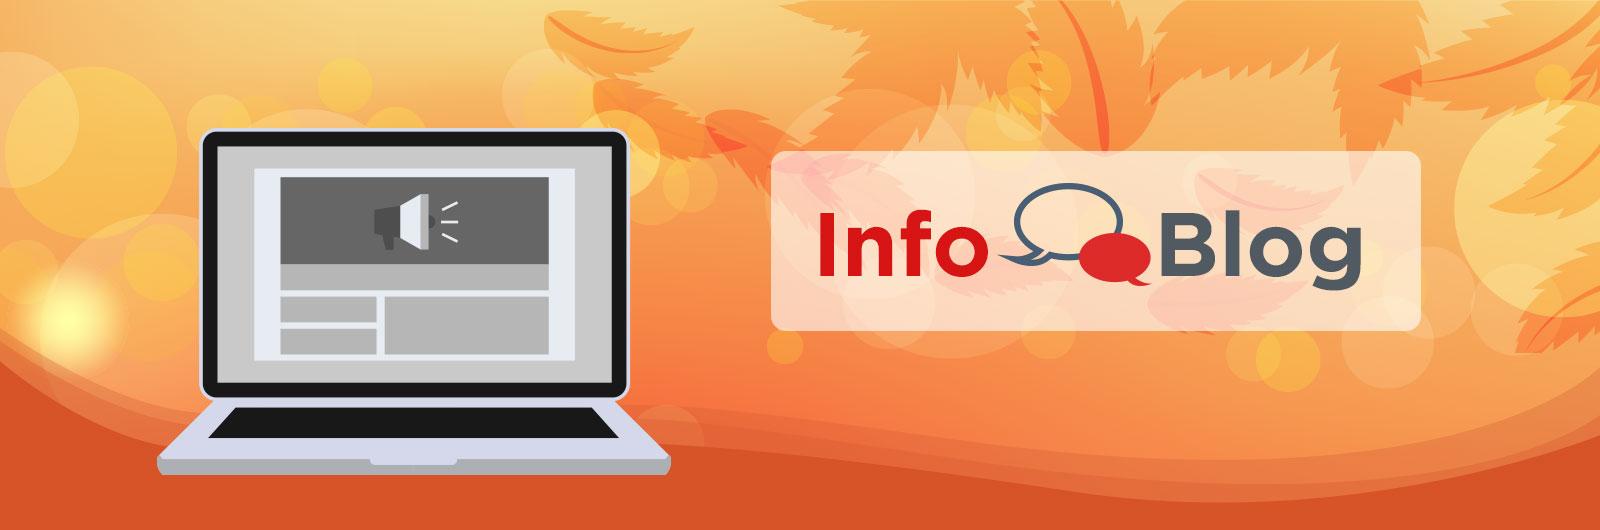 info-blog